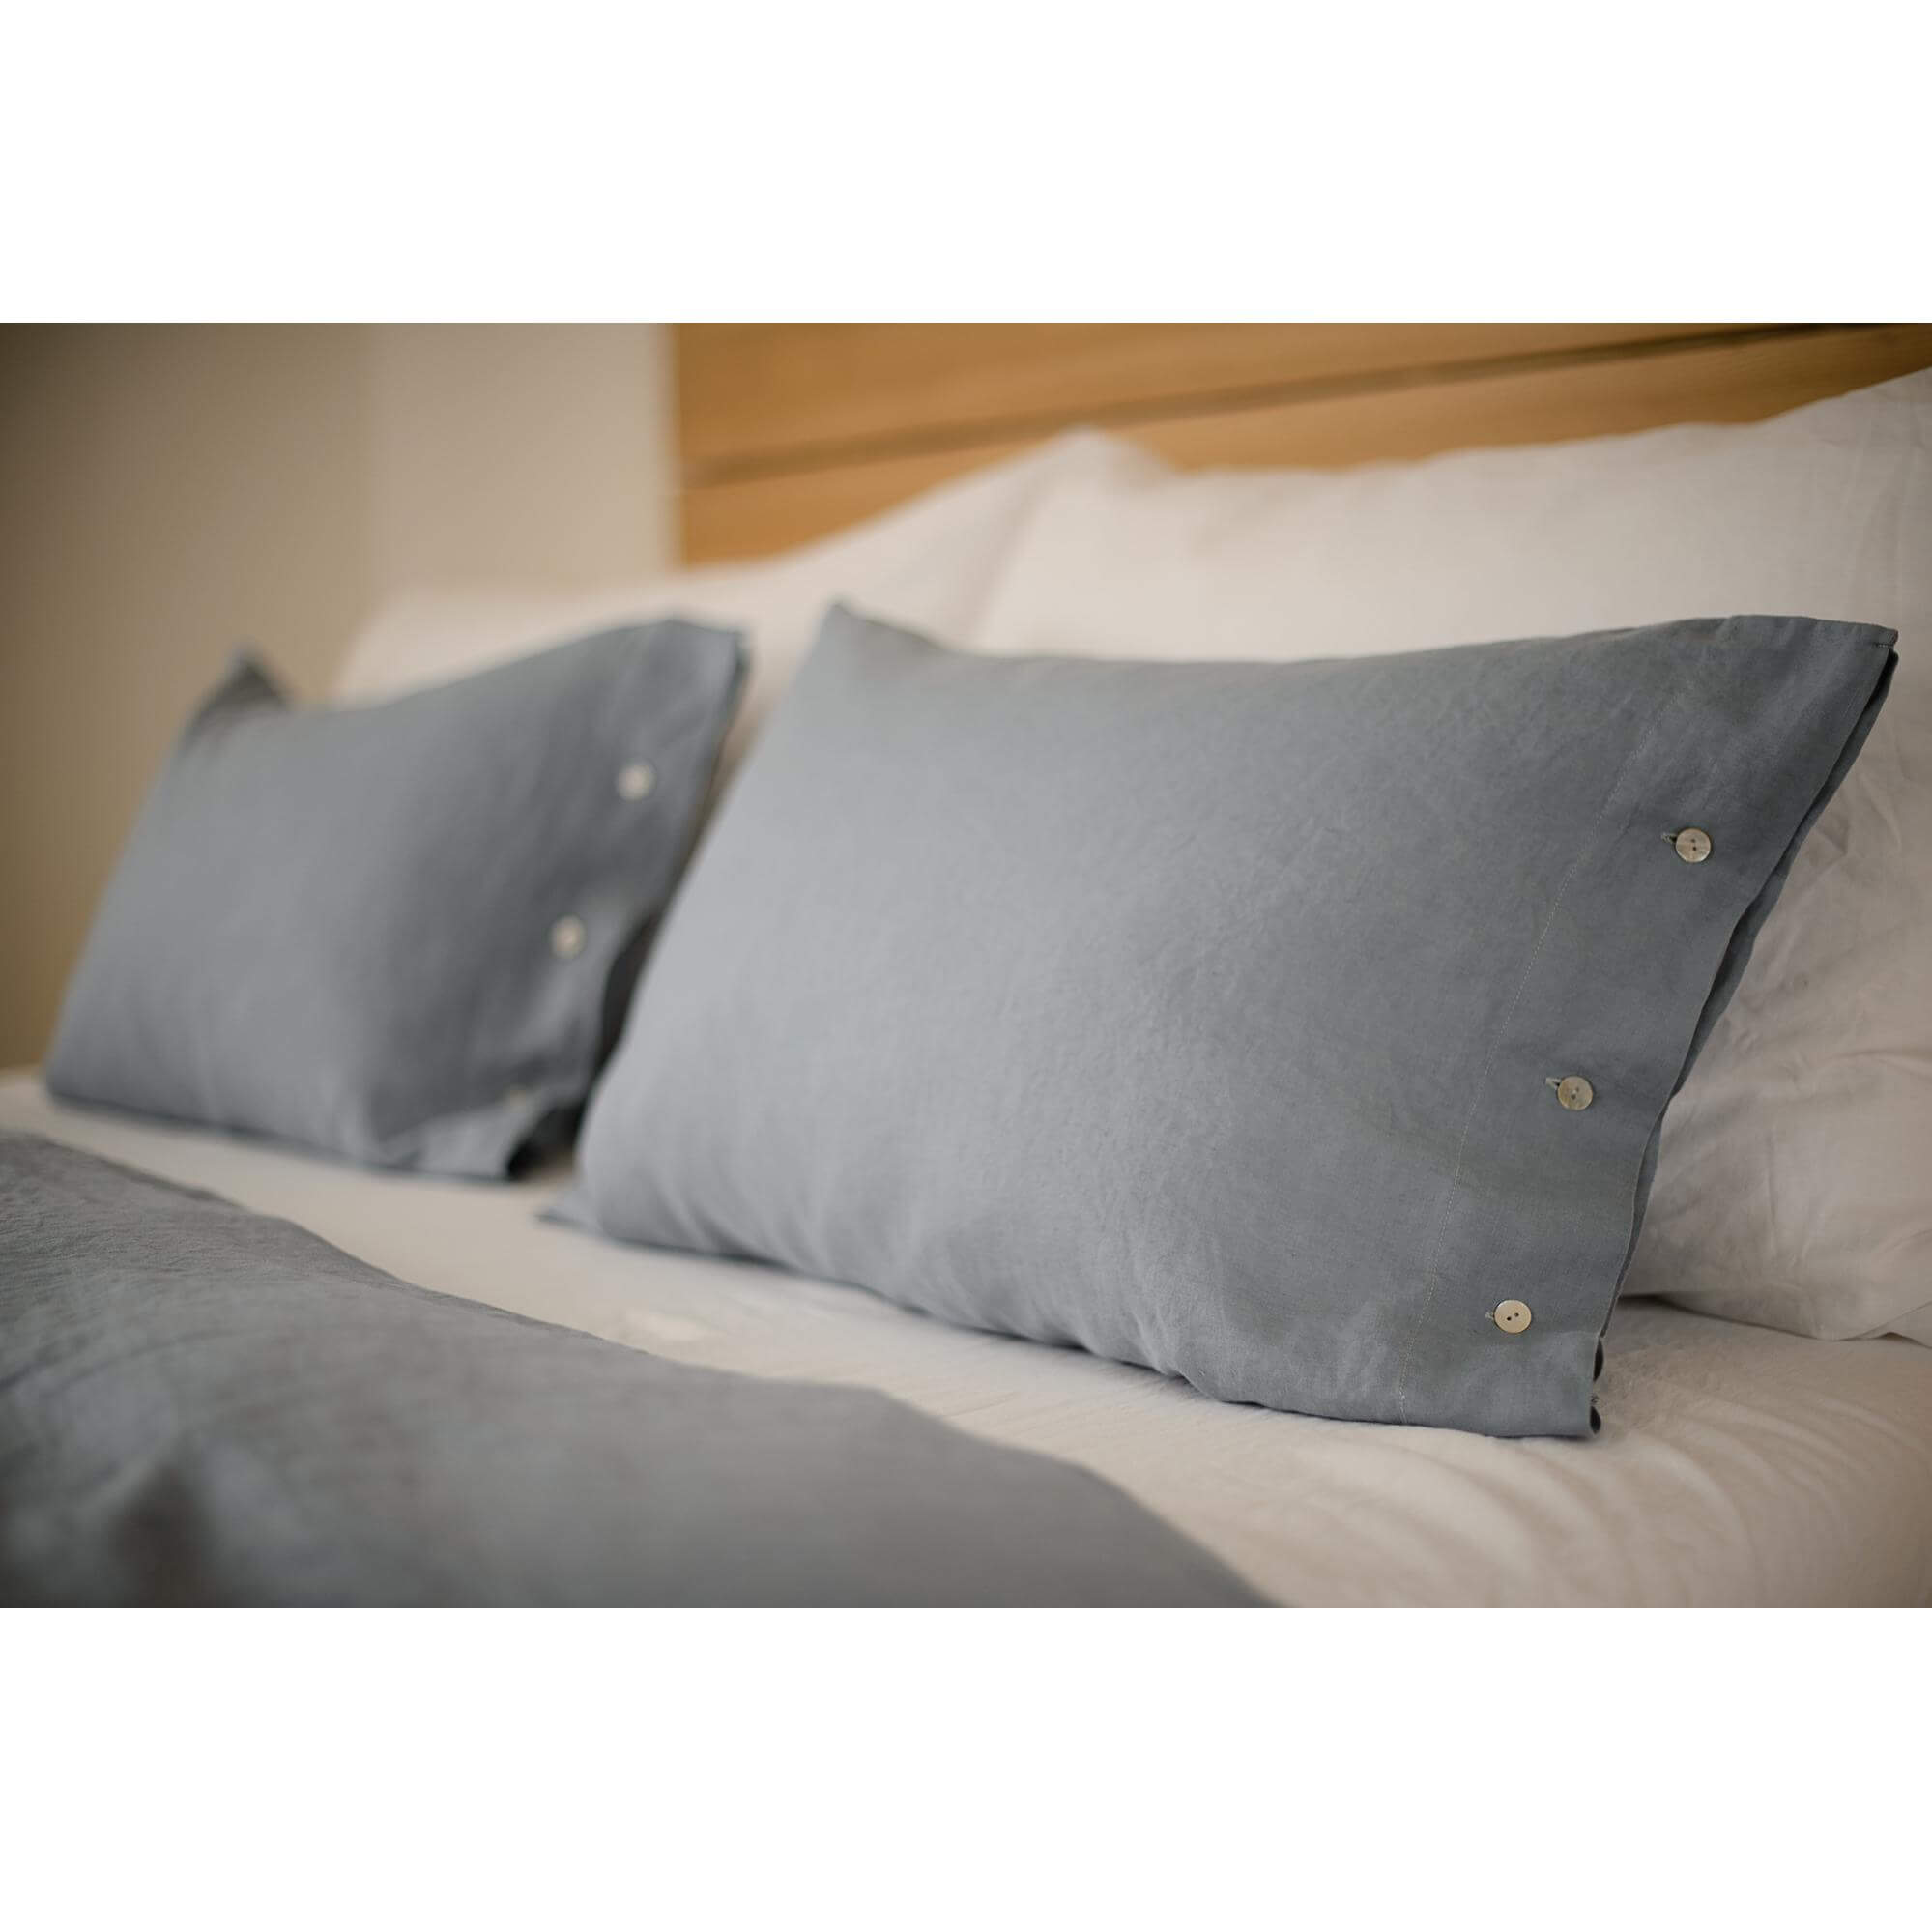 leinen bettw sche ikea leinen bettw sche ikea stuhlbezug aus leinen f r ikea ikea v gtistel. Black Bedroom Furniture Sets. Home Design Ideas